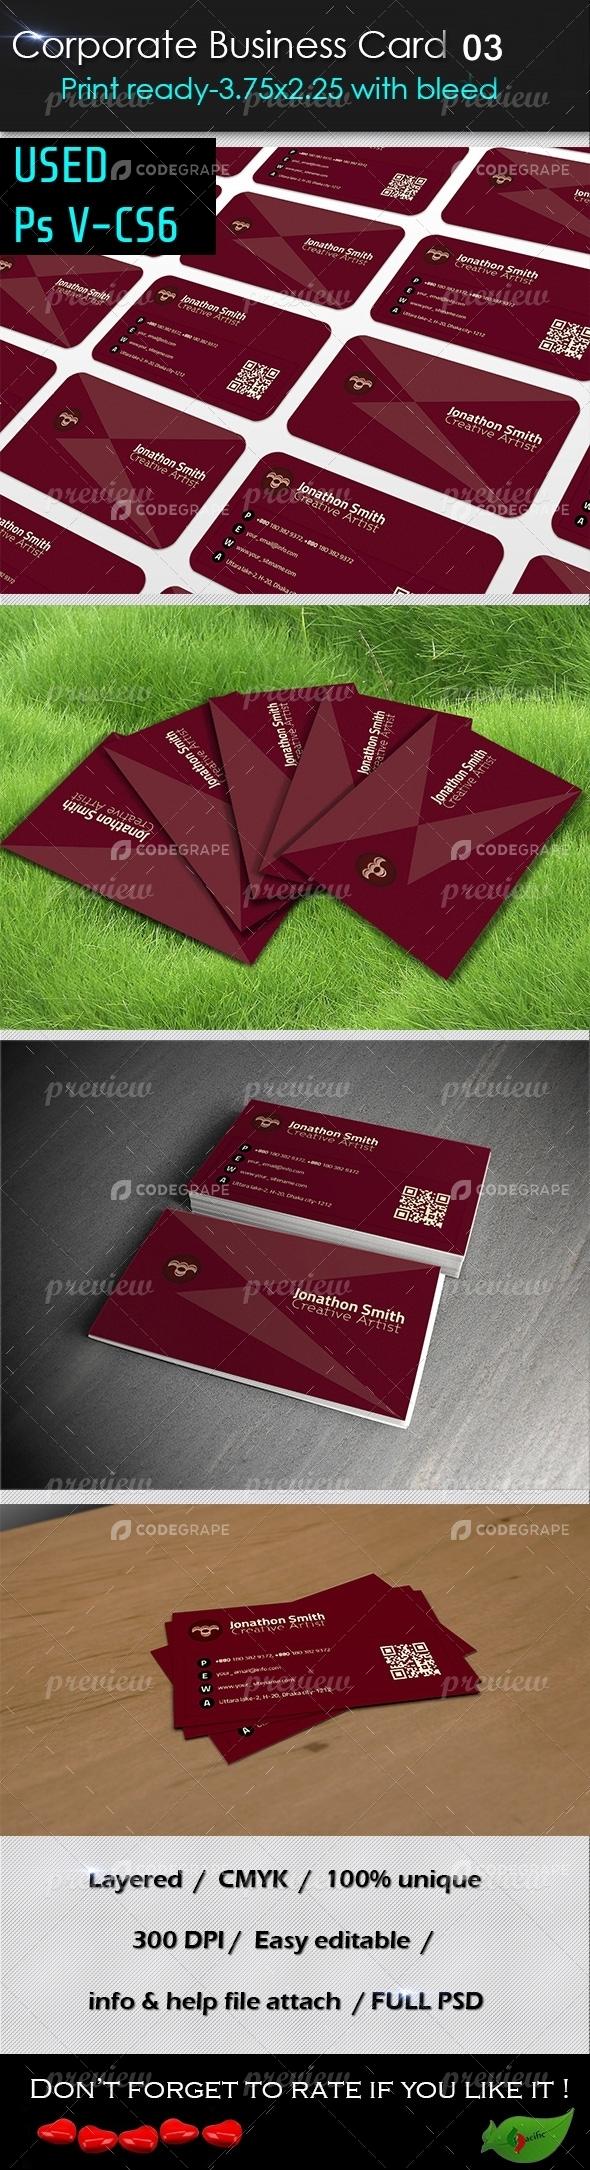 Corporate Business Card 03